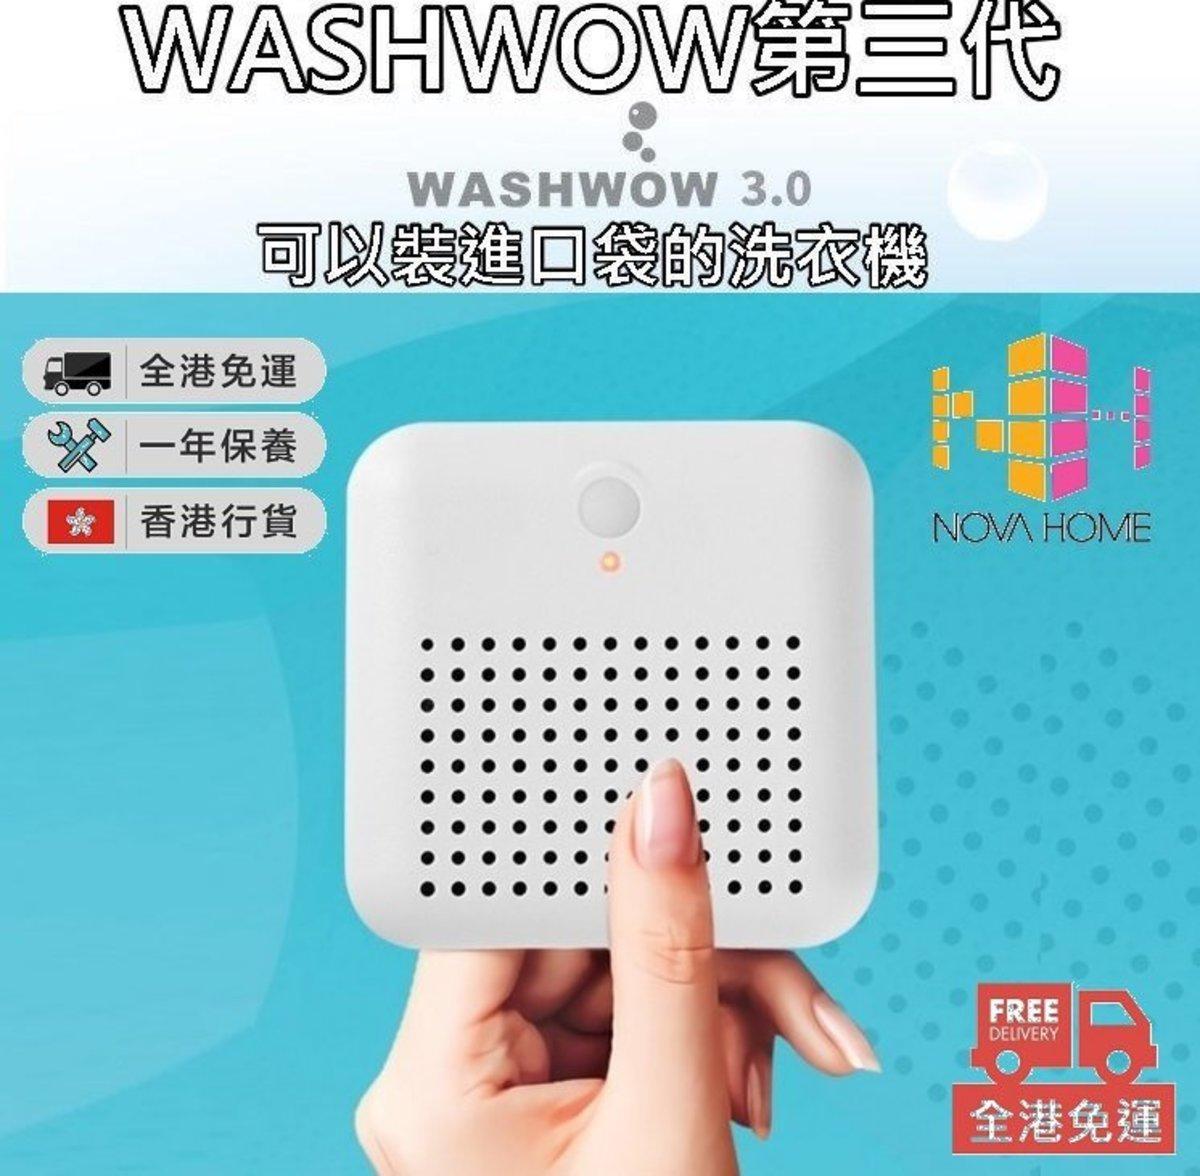 Washwow 3.0 USB 迷你洗衣機 便攜洗衣蛋 三代殺菌消毒洗滌器 洗衫神器